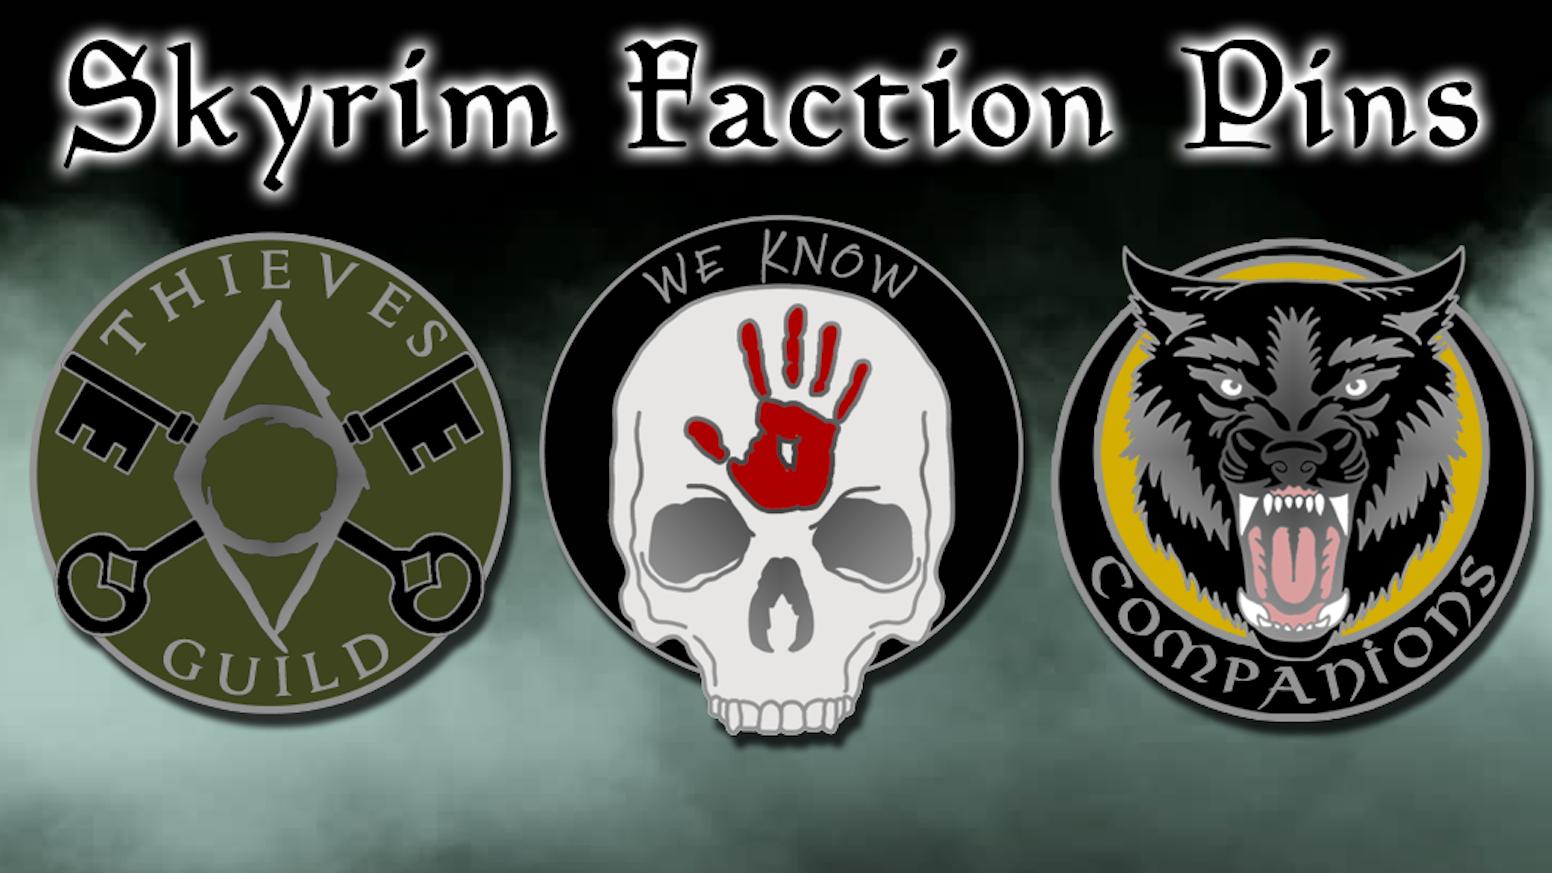 Skyrim Faction Enamel Pins By Sword Whetstone Kickstarter